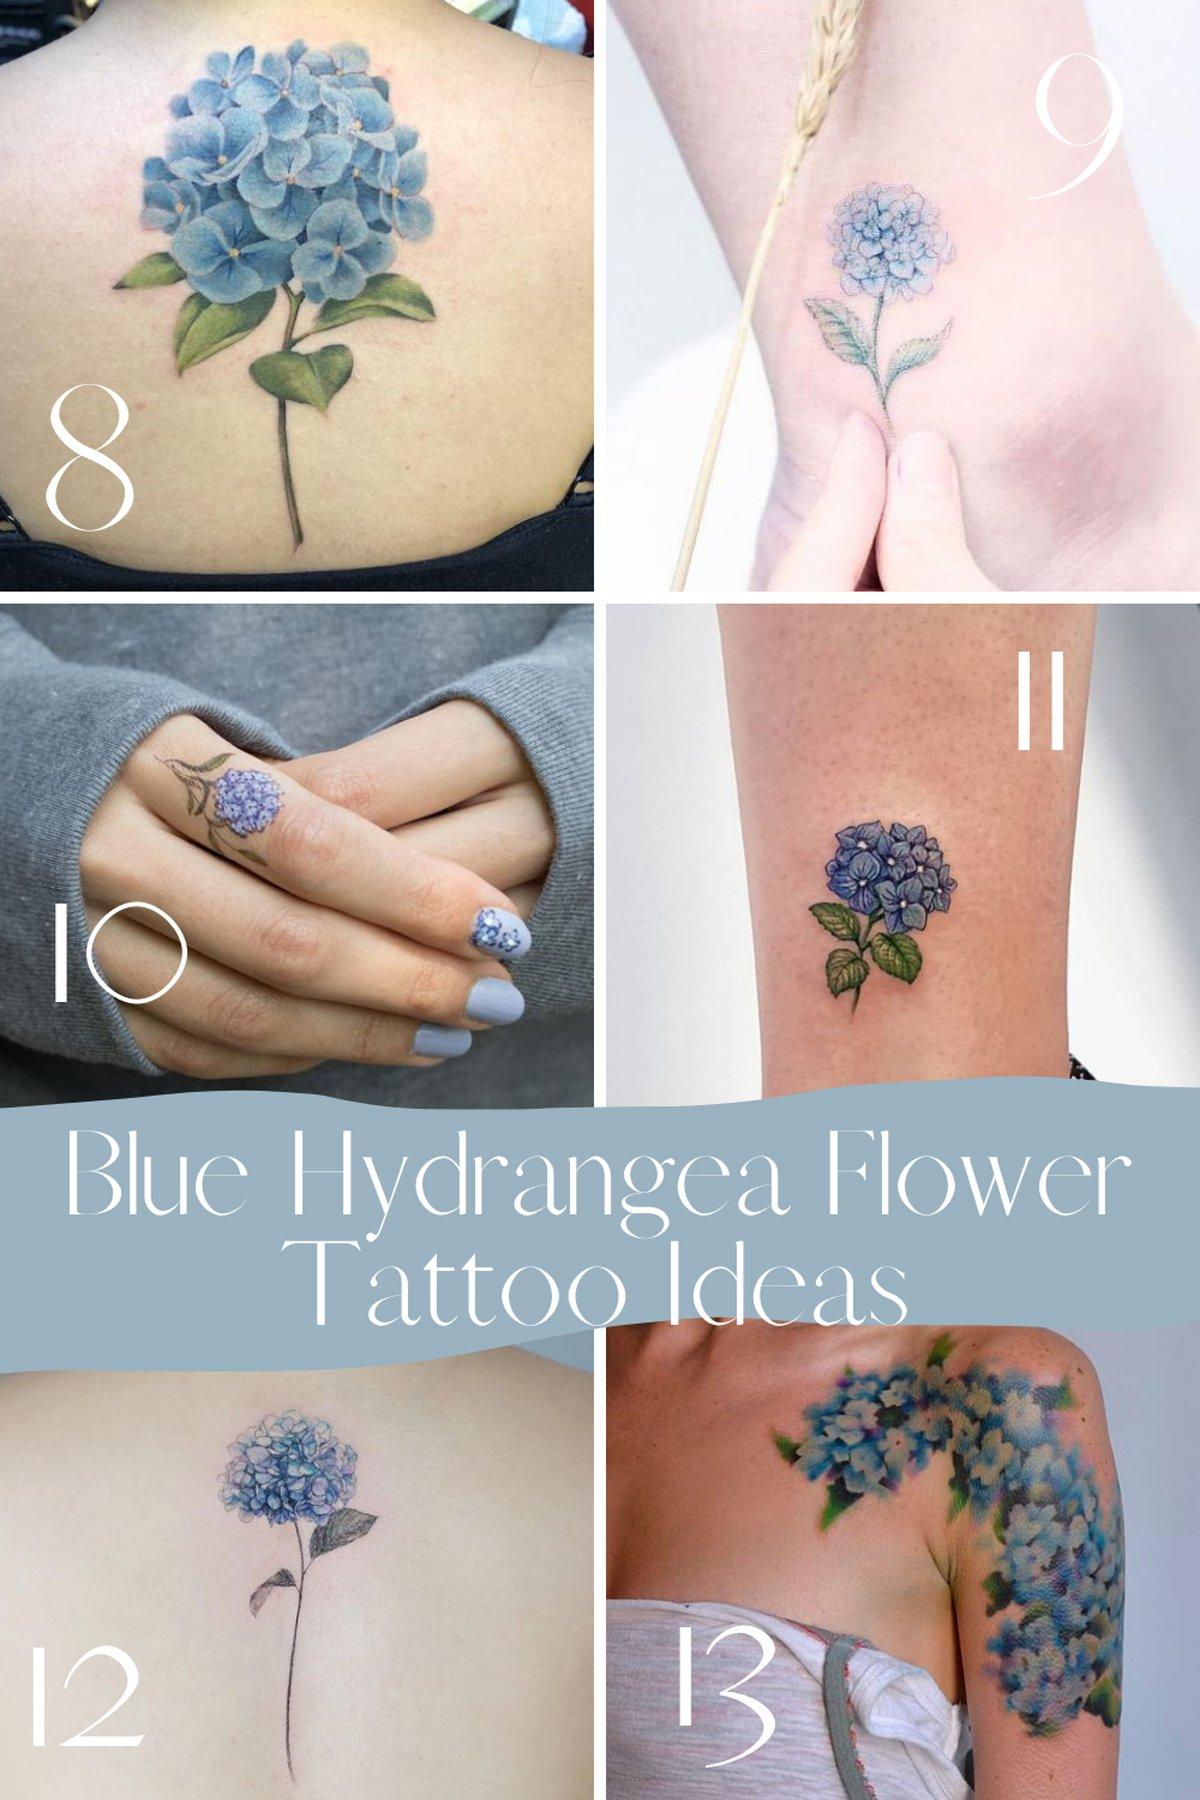 Blue Hydrangea Flower Tattoo